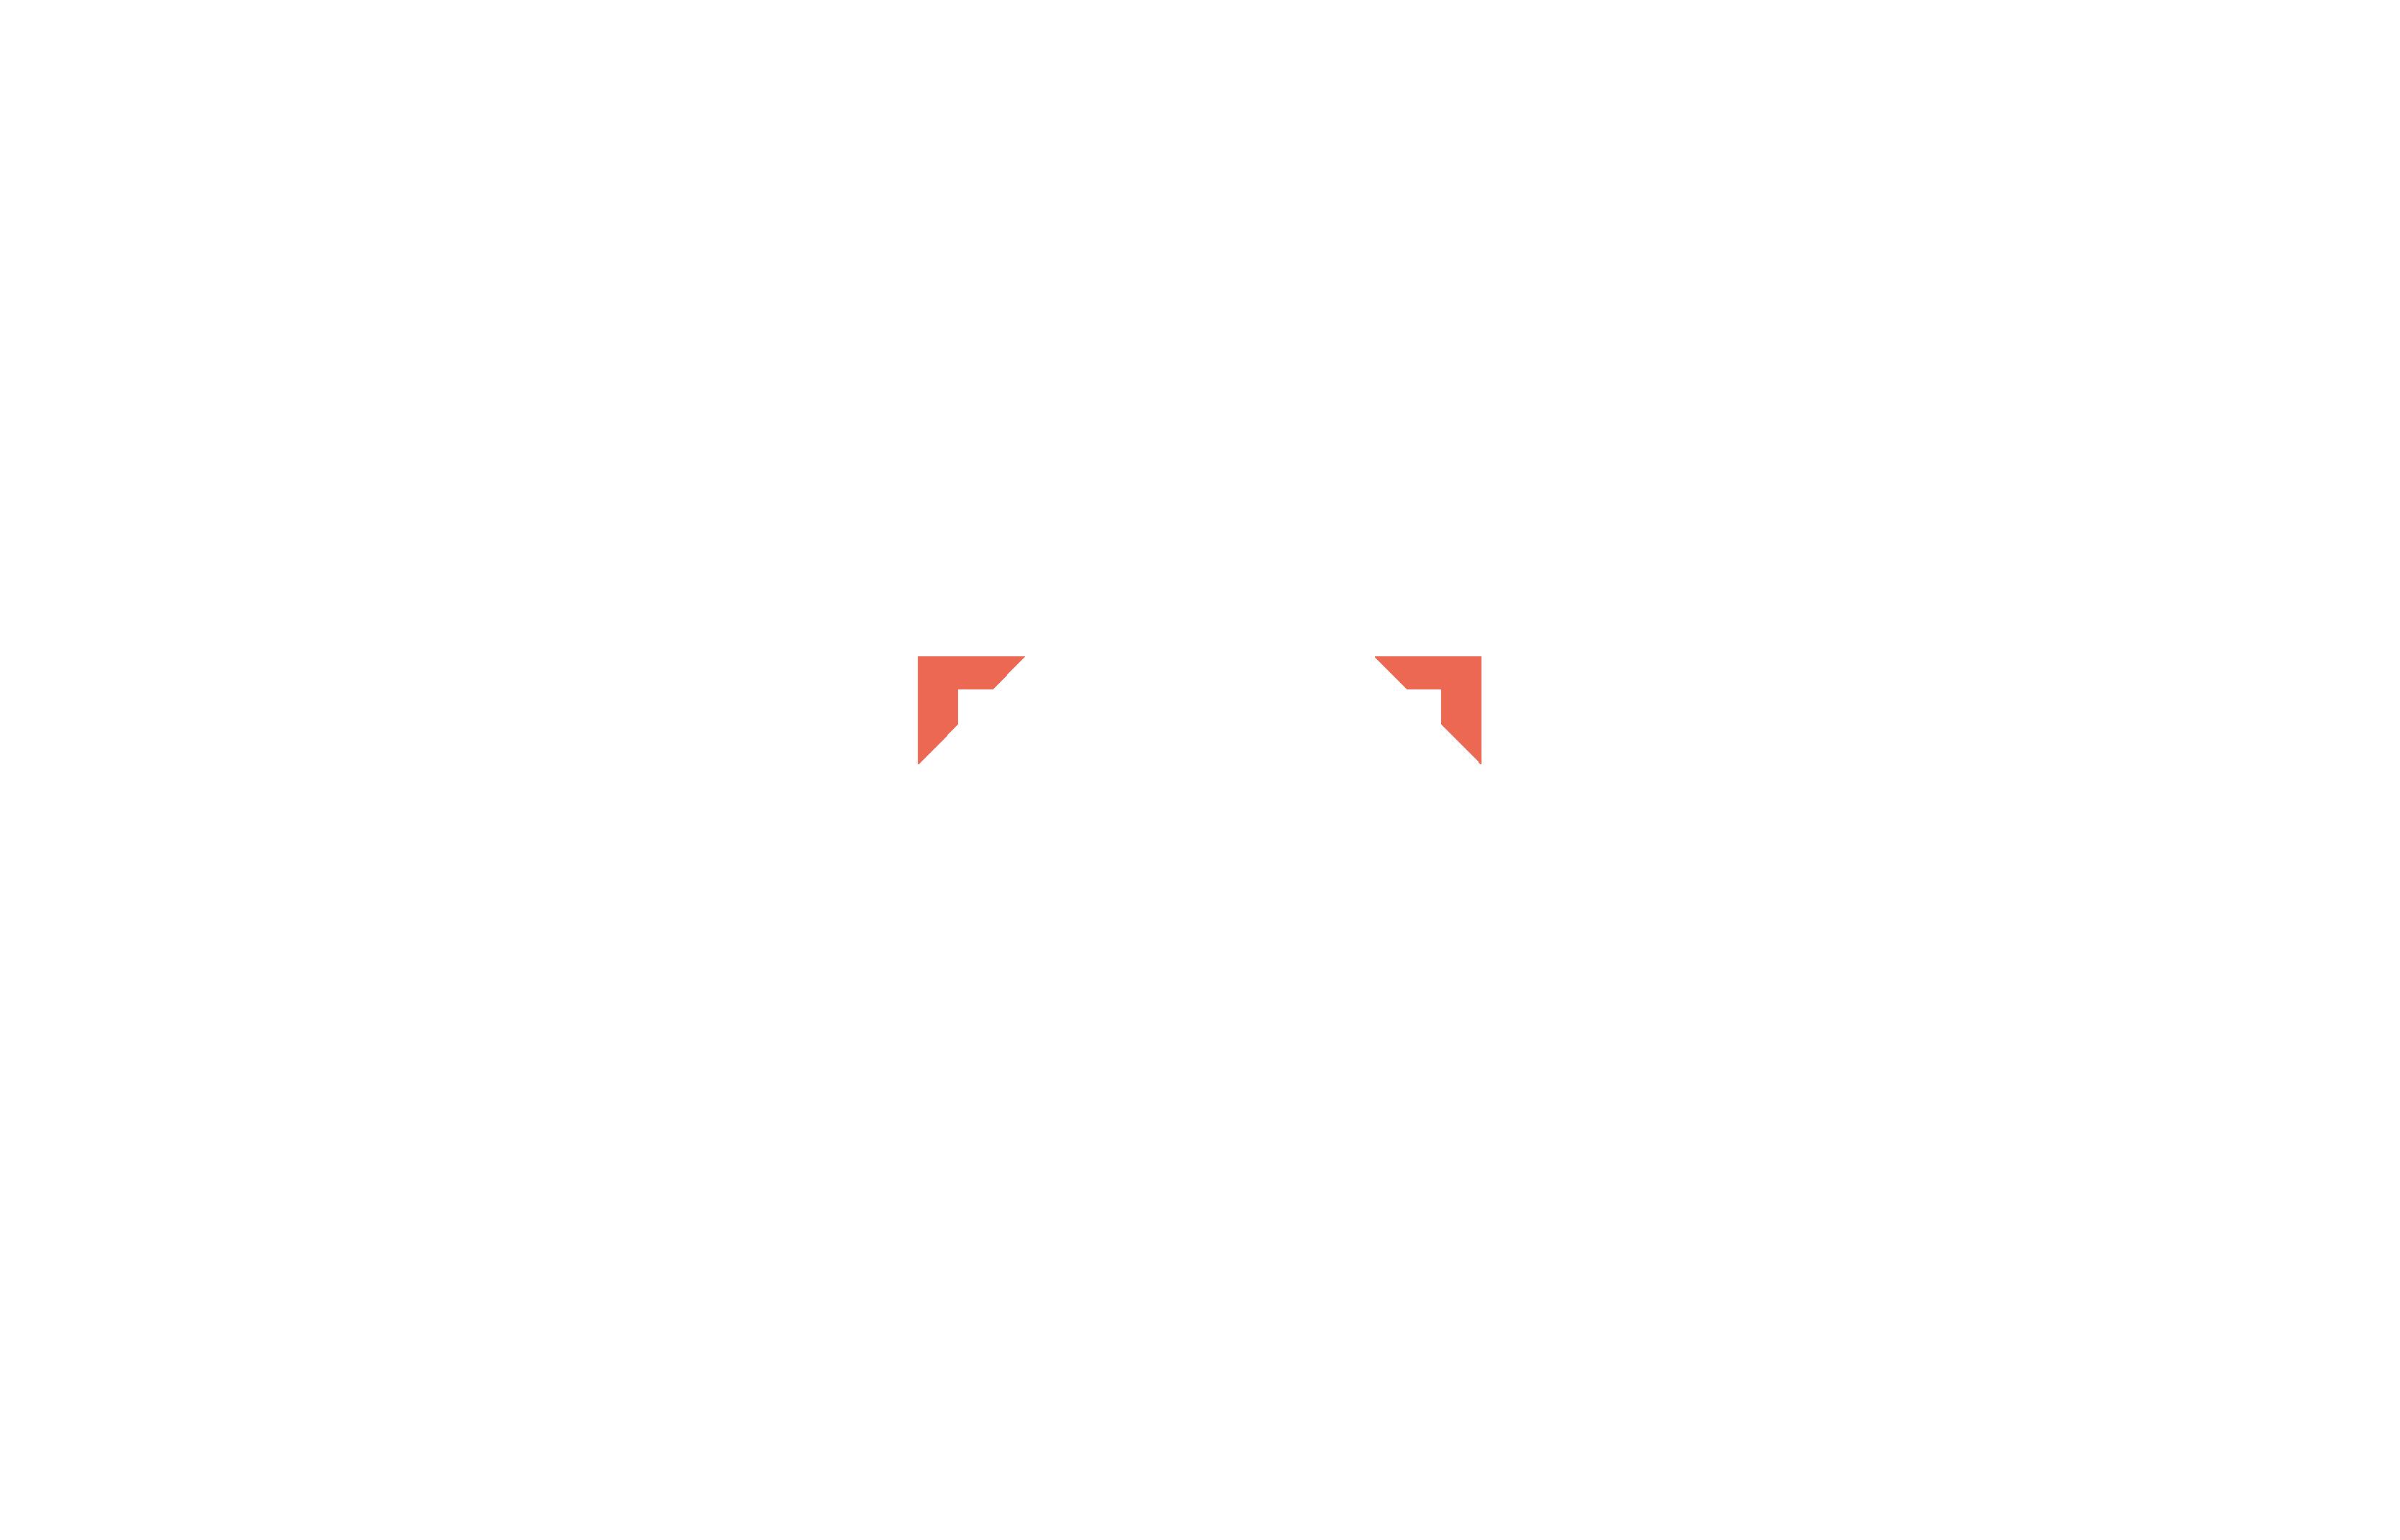 dk-transparant-studiosont_dk-mark-wit